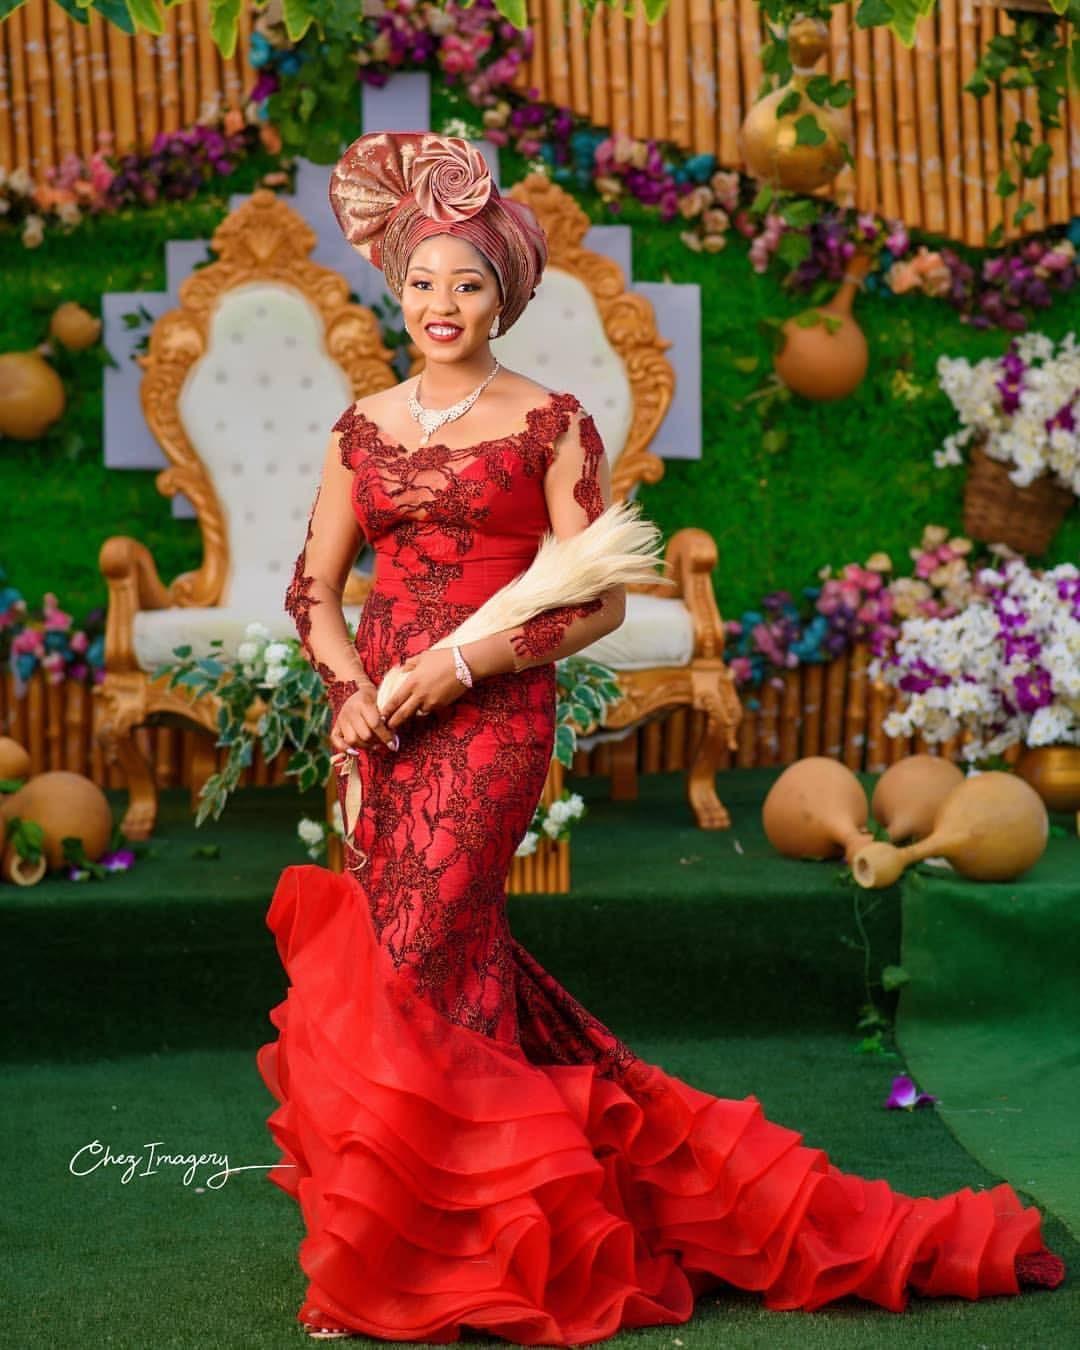 Igboweddingng On Instagram Beautiful Chiọma Asa Maru Over Daila19 Decor In 2020 With Images African Bridal Dress Traditional Wedding Attire African Traditional Wedding